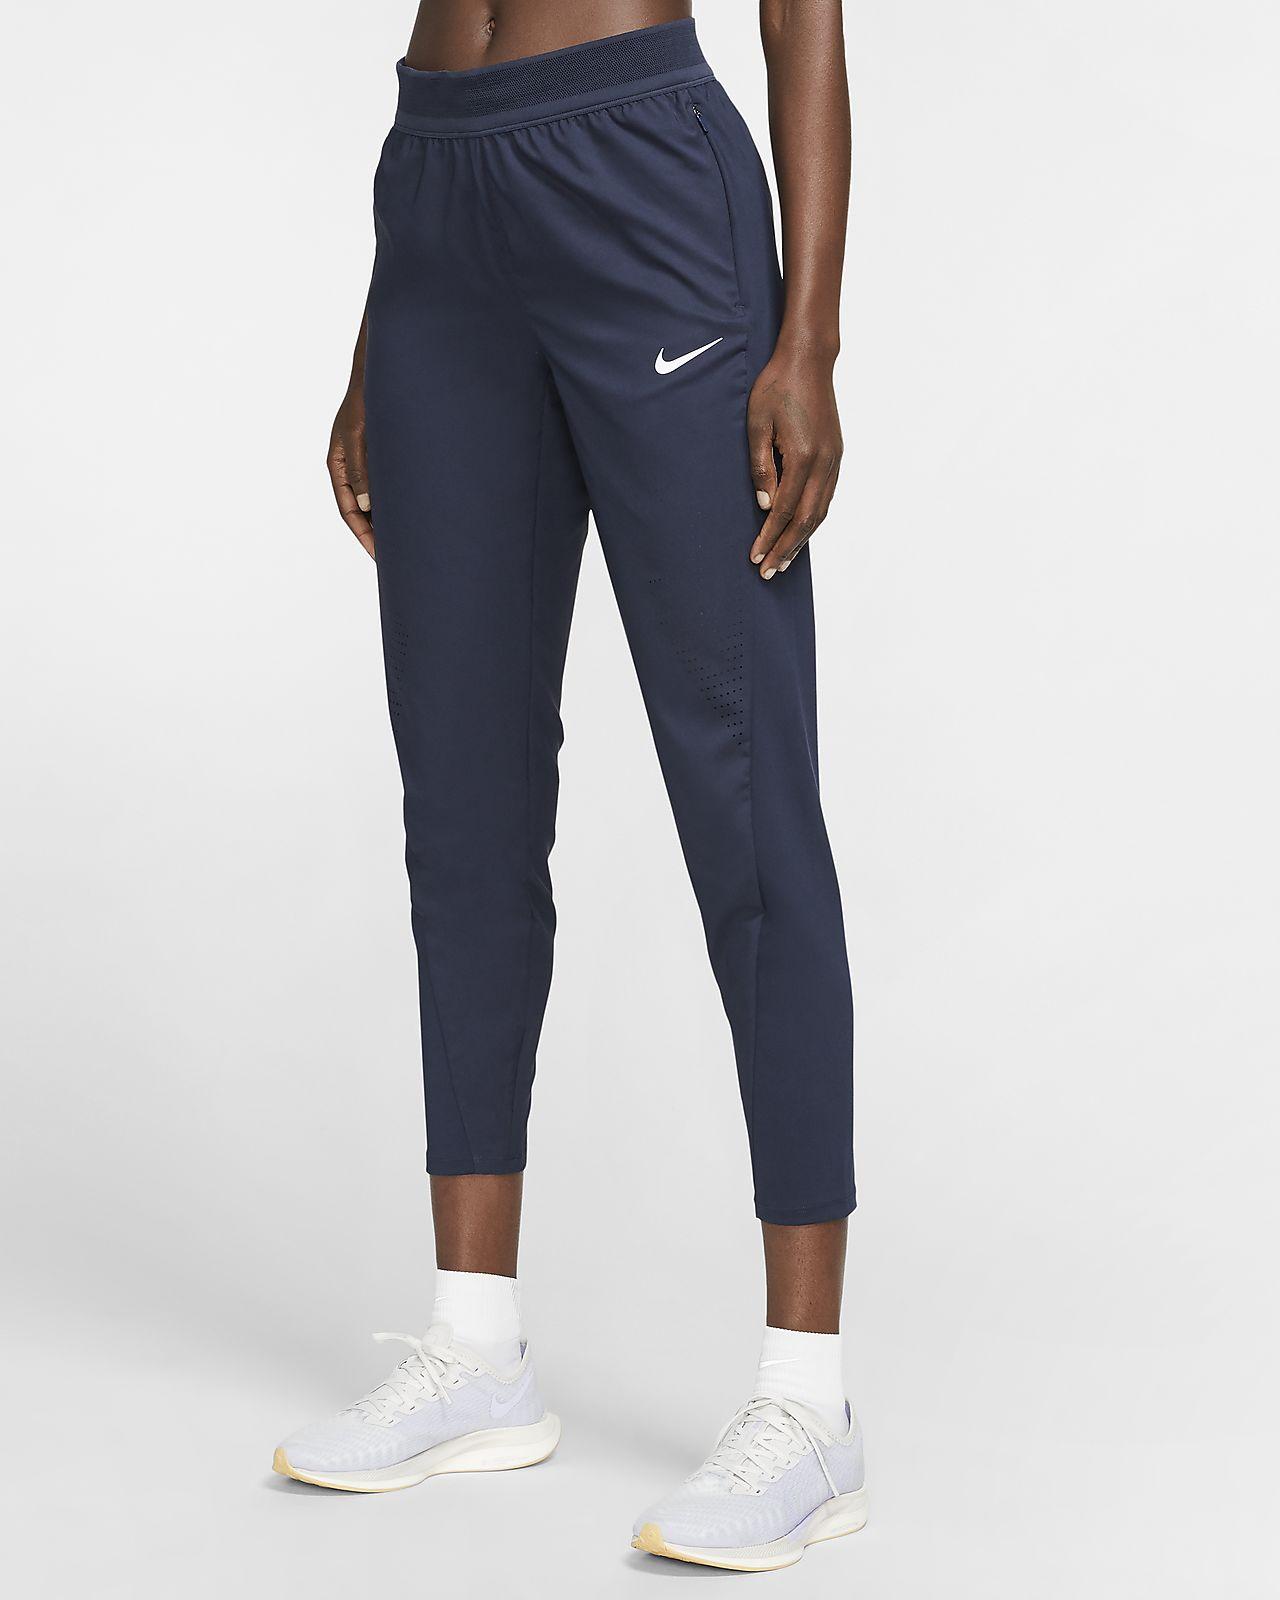 pantaloni running nike donna